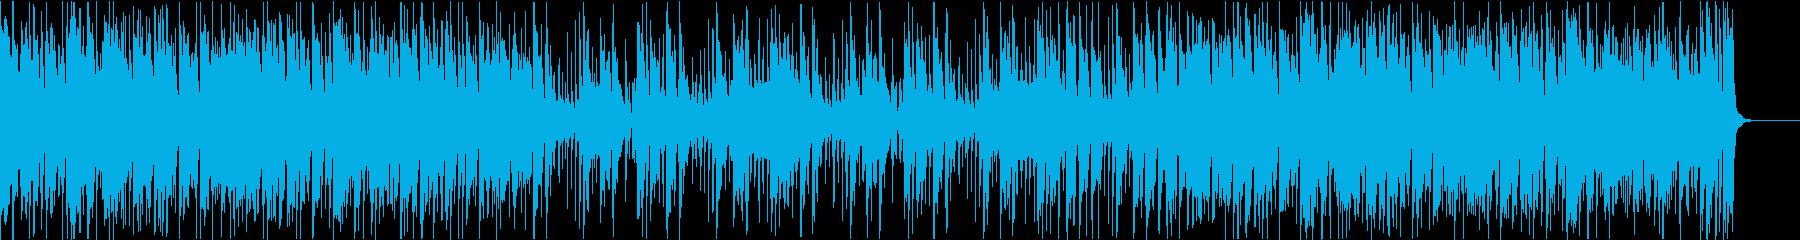 Ikeike / Fast Jazz / Karaoke's reproduced waveform